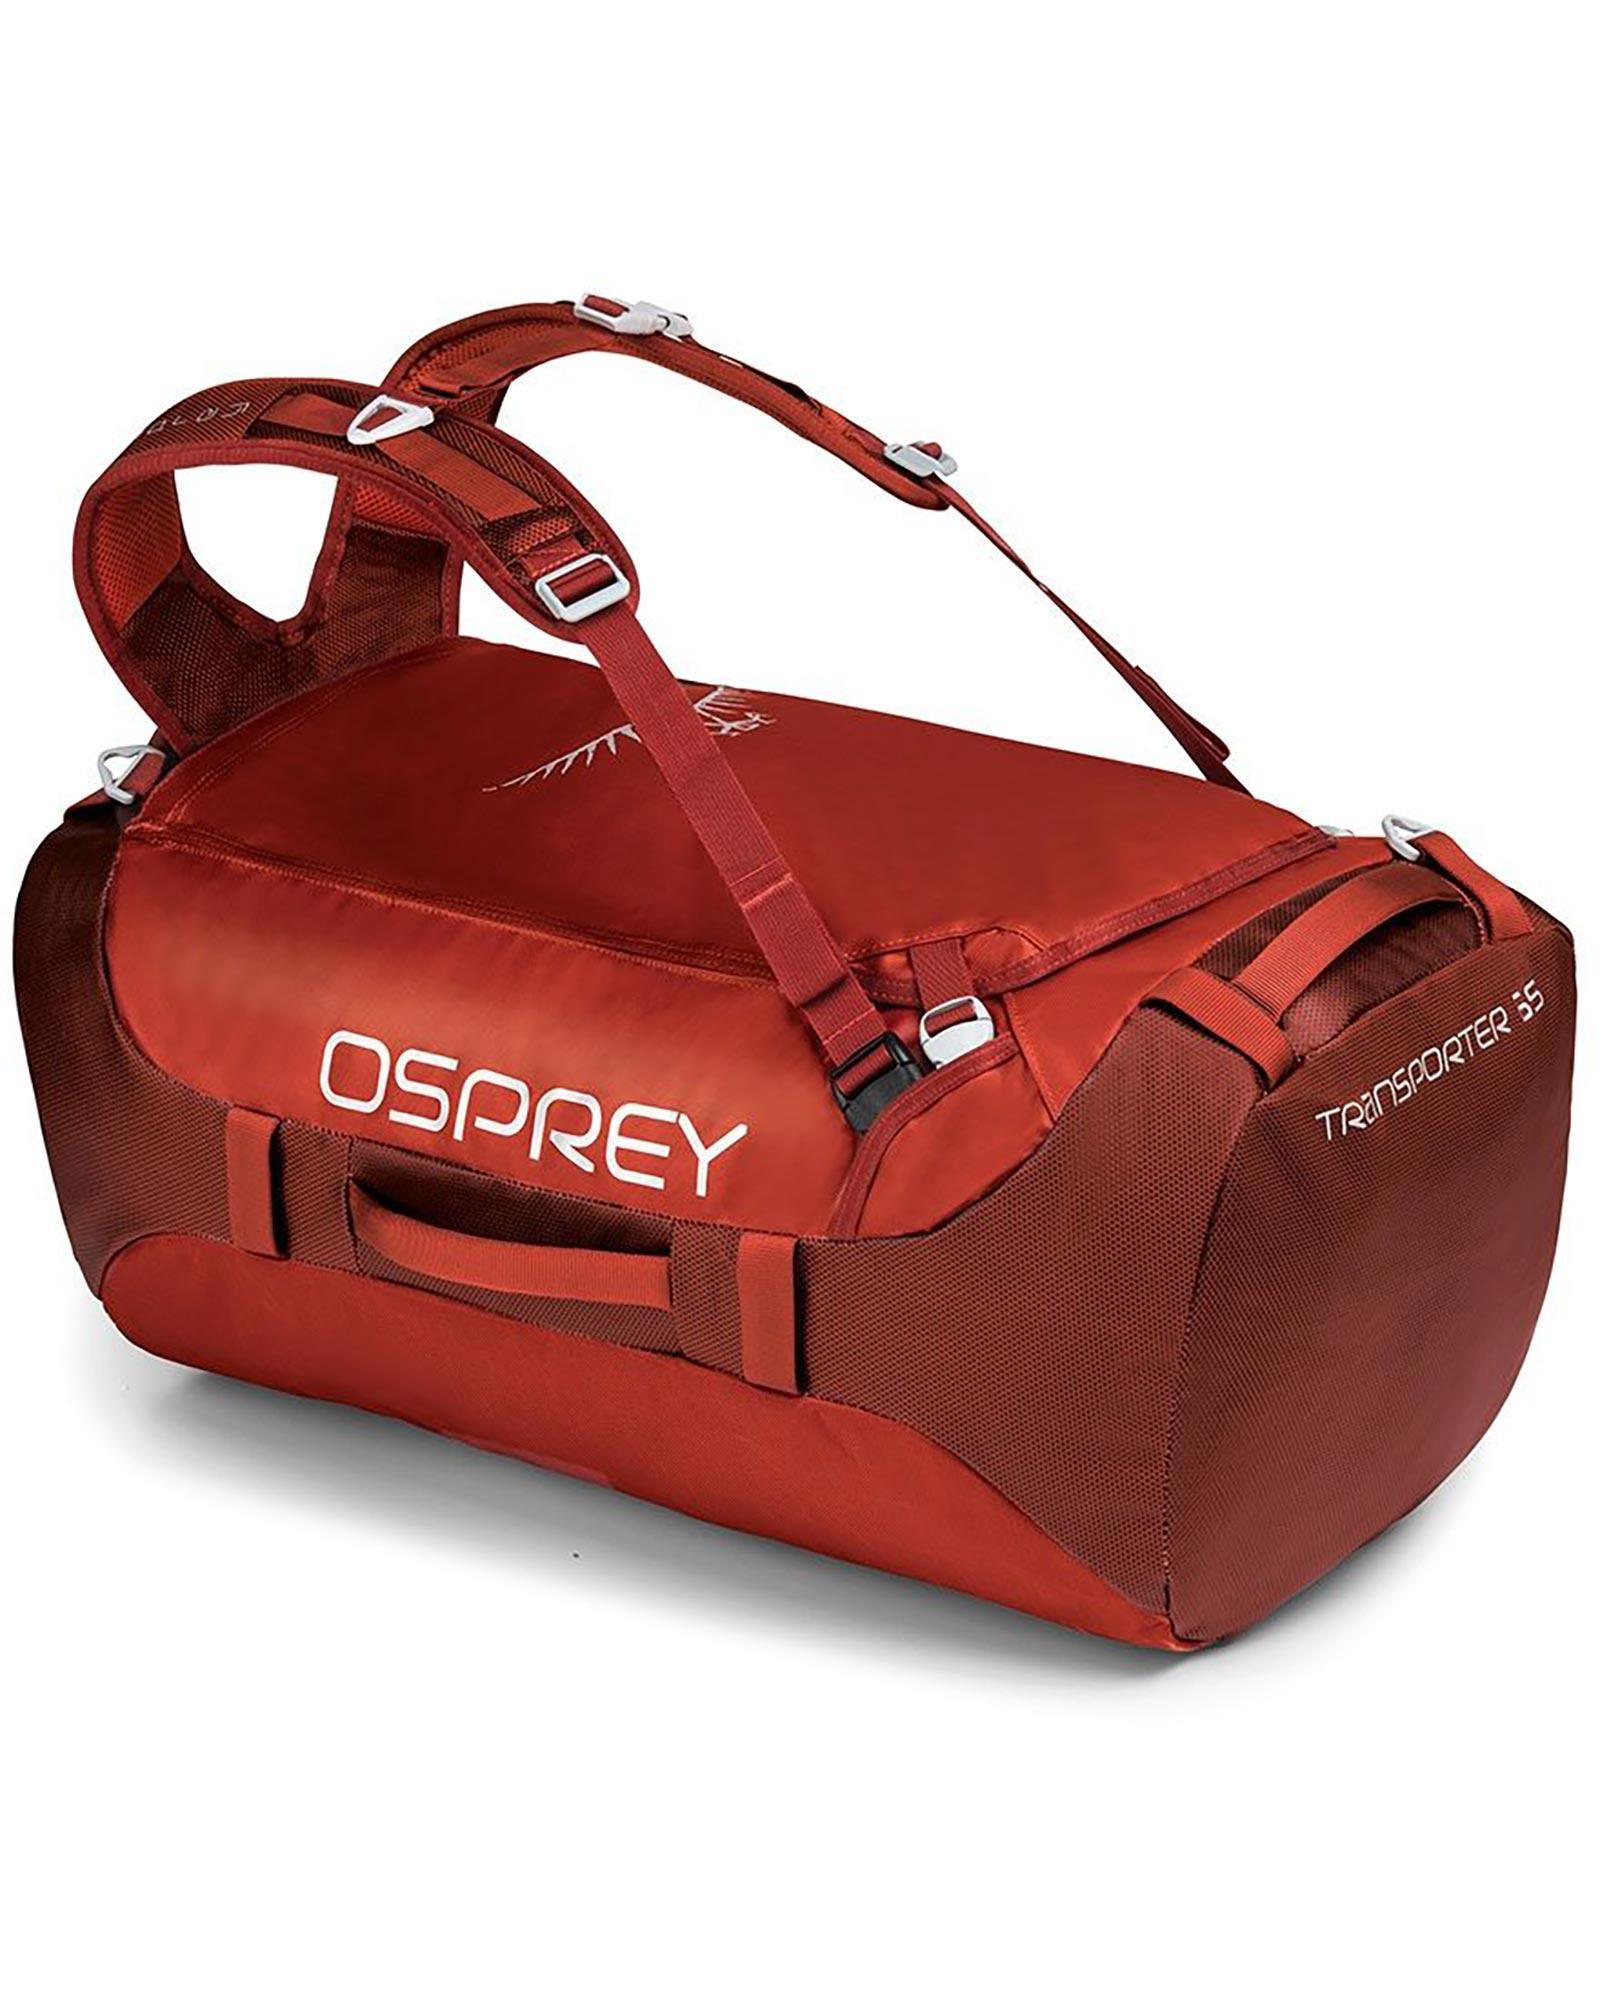 Osprey Transporter 65 Duffel 0